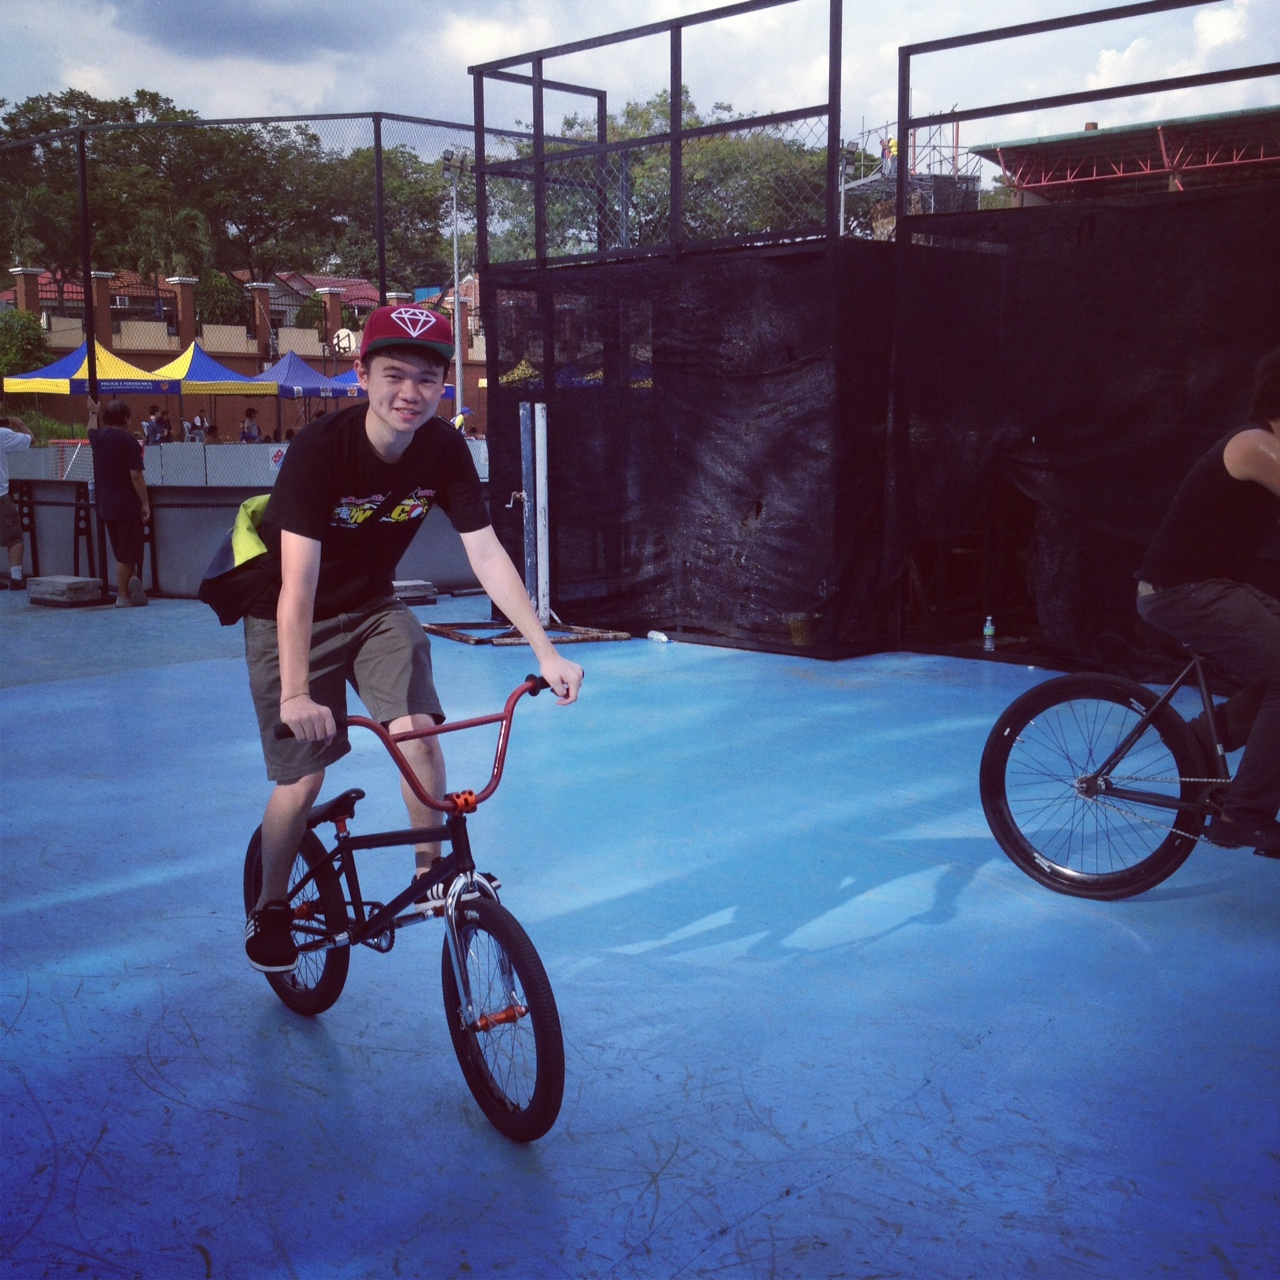 BMX AT ASSUNTA SKATE PARK